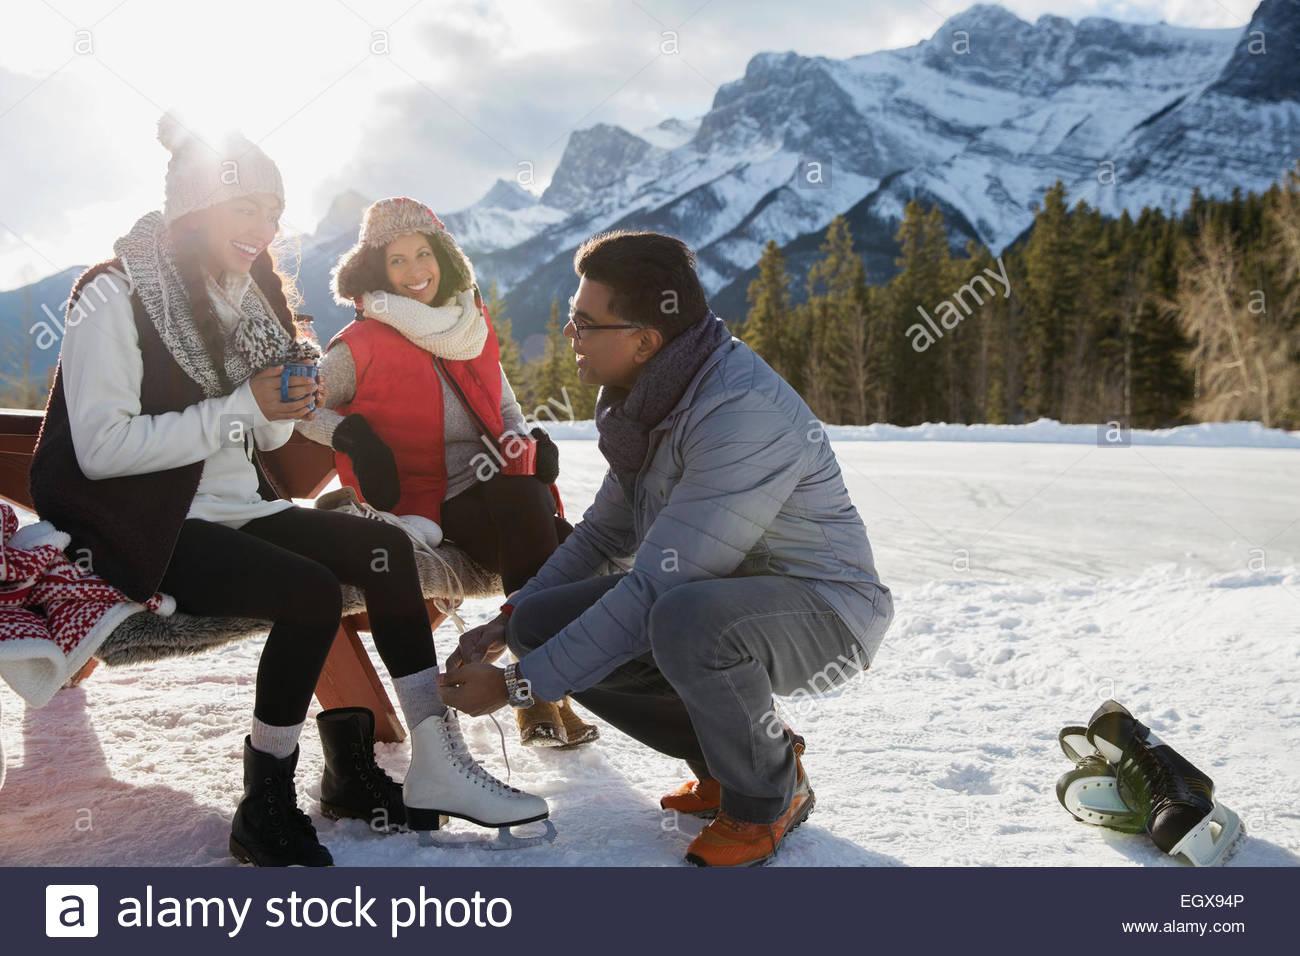 Family putting on ice skates below snowy mountain - Stock Image